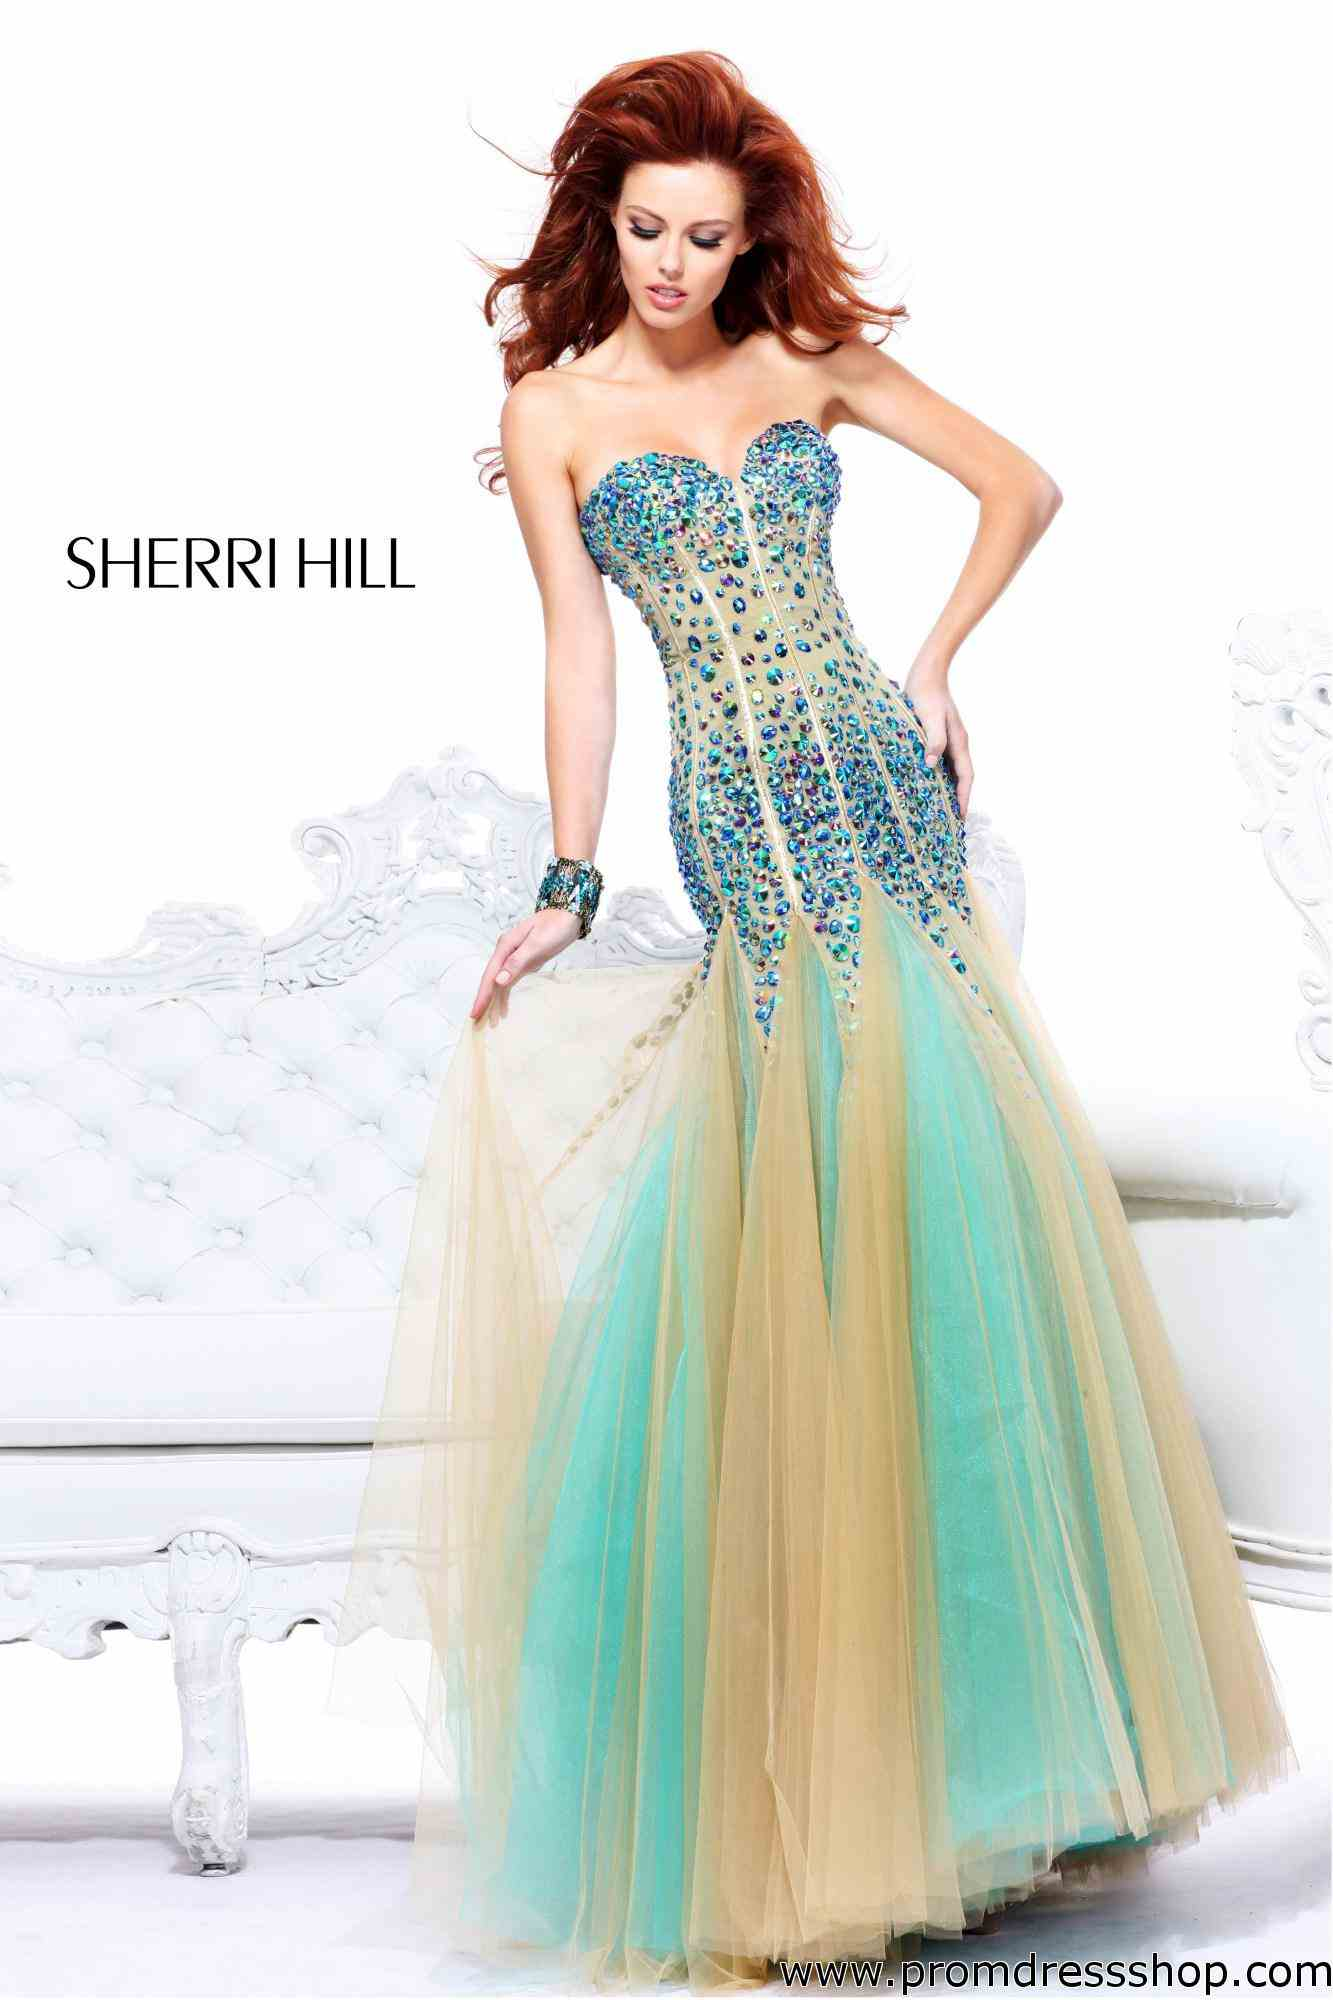 Sheri Hill Prom Dresses